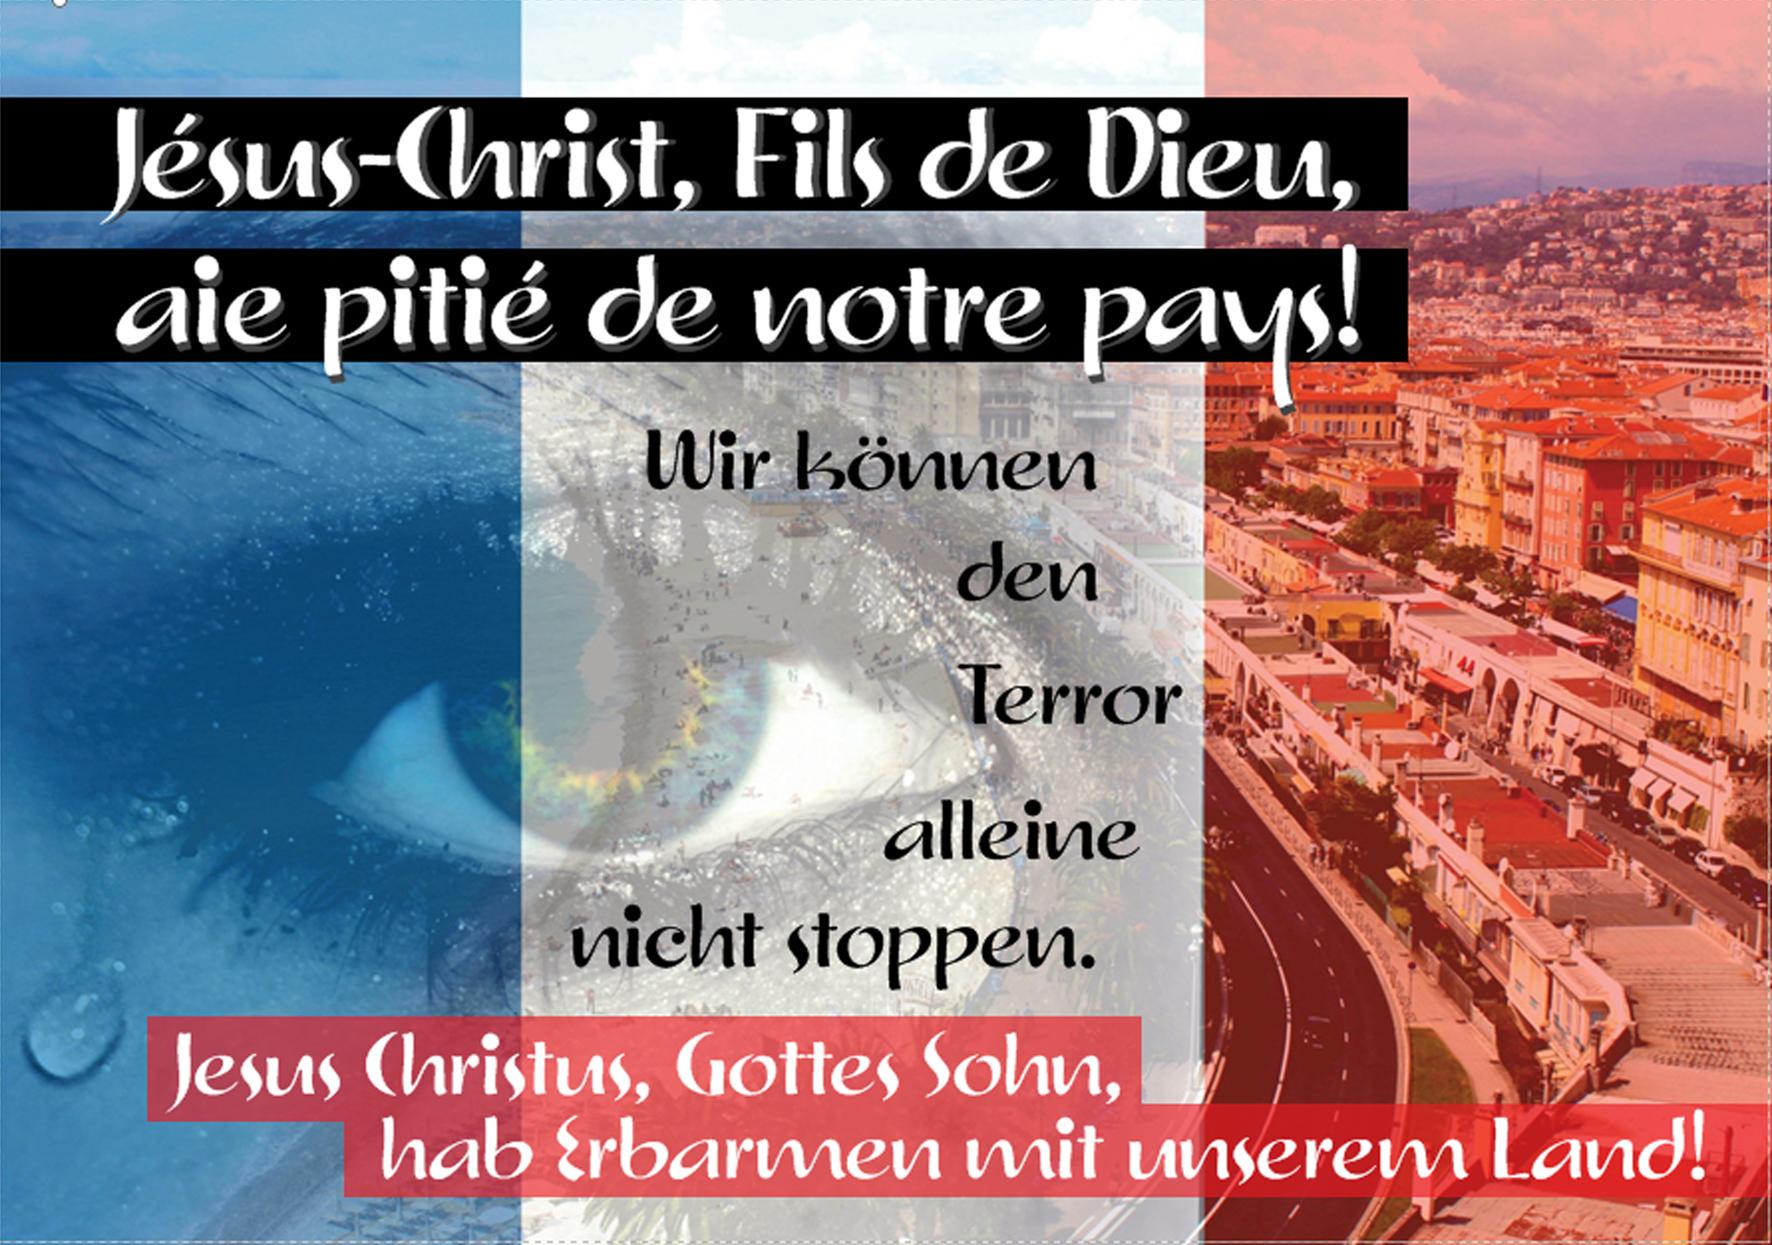 Frankreich-Nizza-pixabay-Alexas-Fotsos-nice-1518487-bea2-vorsch